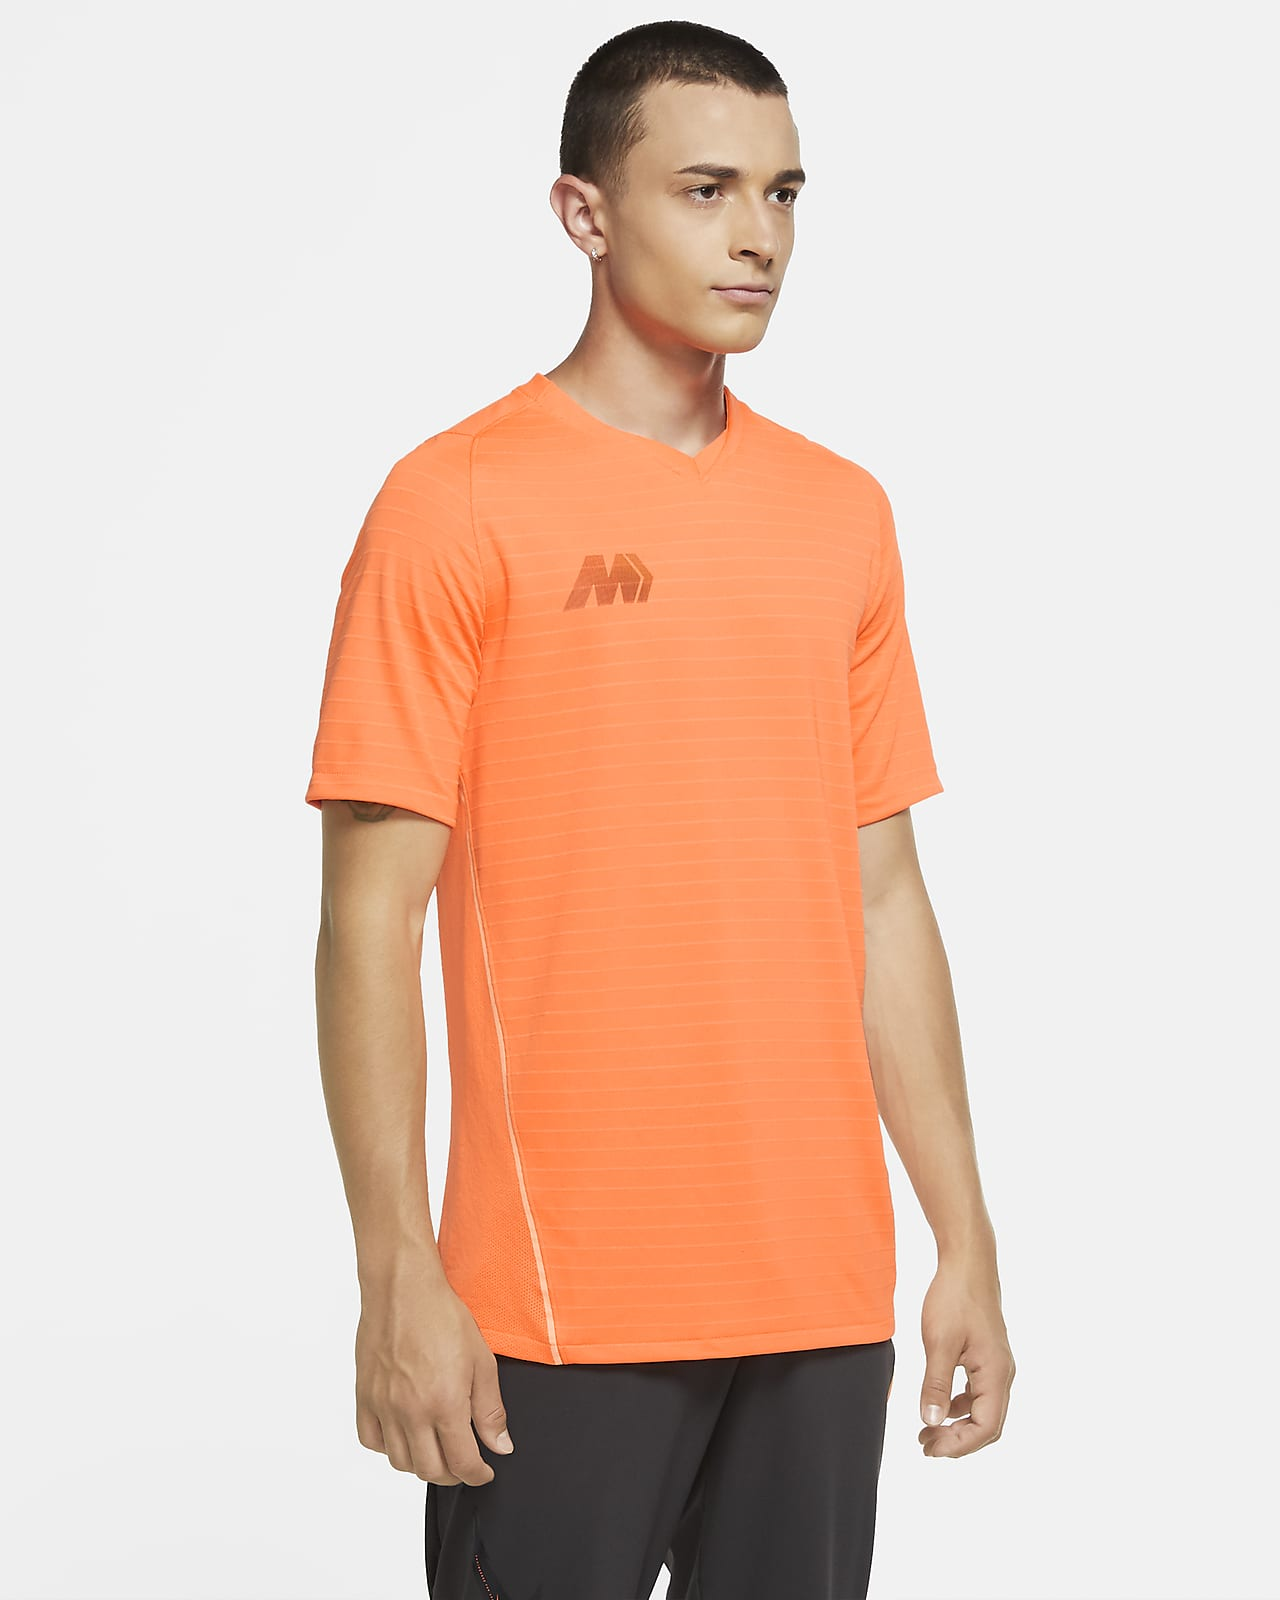 Nike Dri-FIT Mercurial Strike Voetbaltop met korte mouwen voor heren